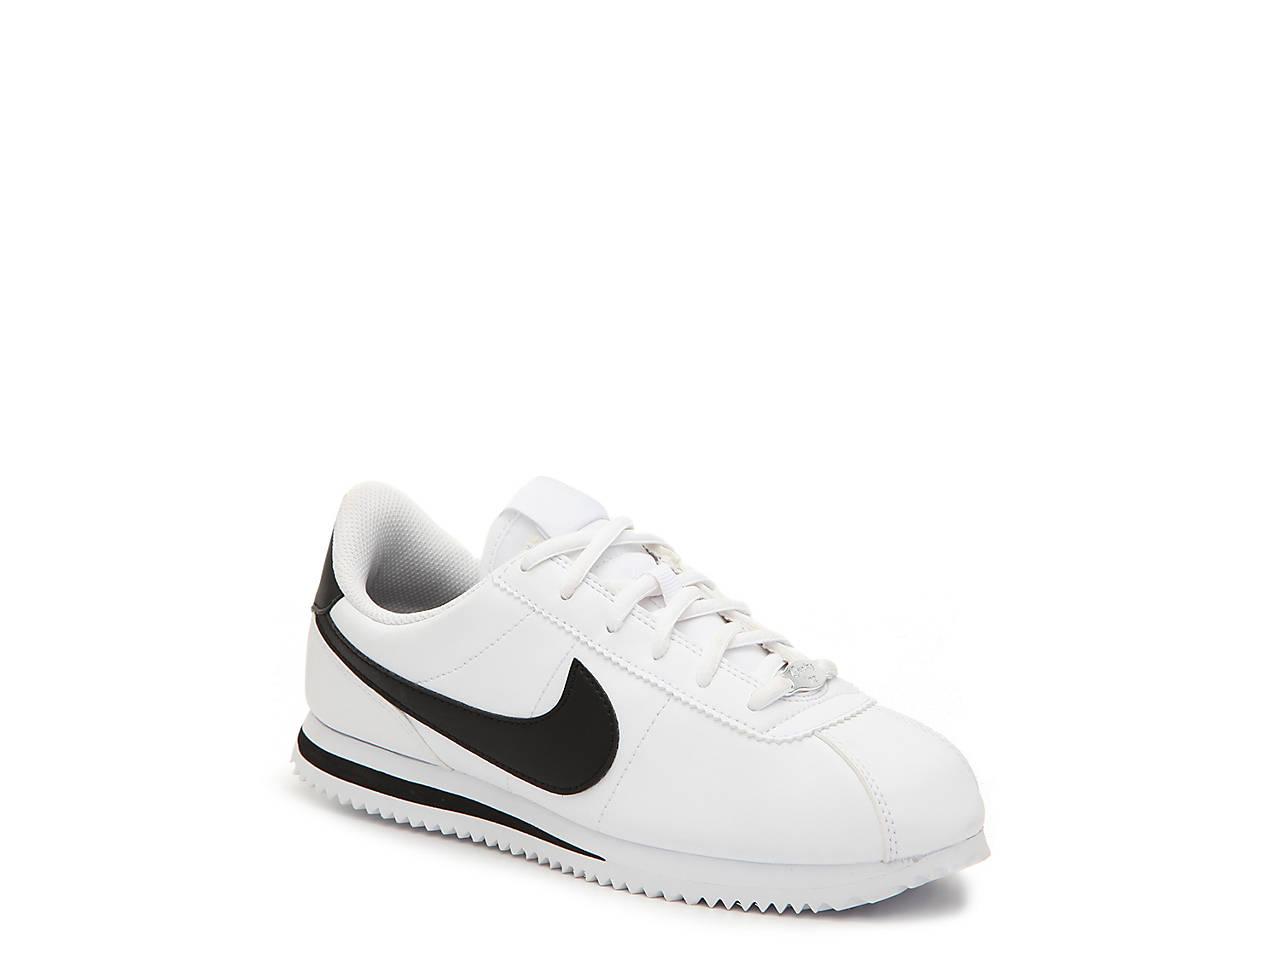 online retailer bb560 ad5de Nike. Cortez Youth Sneaker